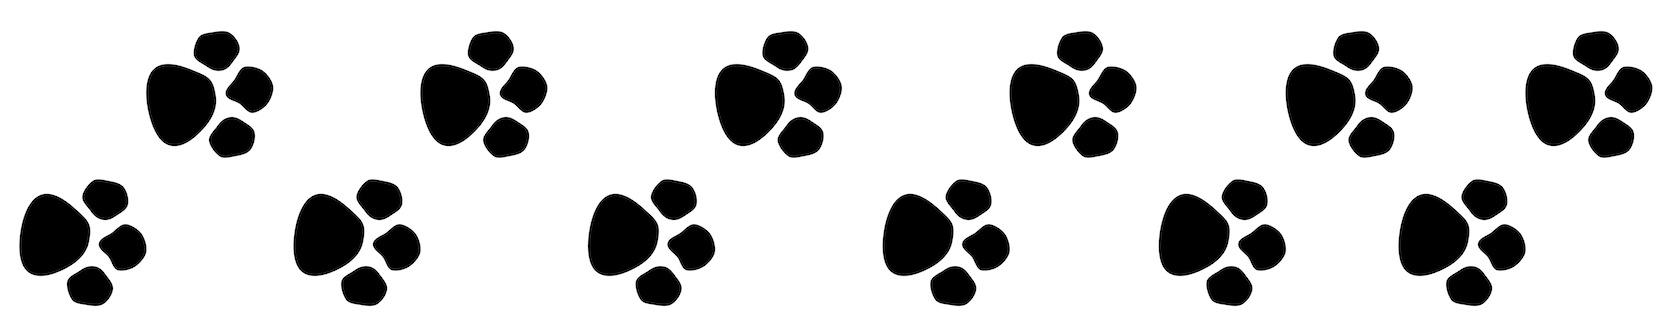 1667x331 Paw Prints Cat Paw Print Clip Art Image Freevectors Clipart